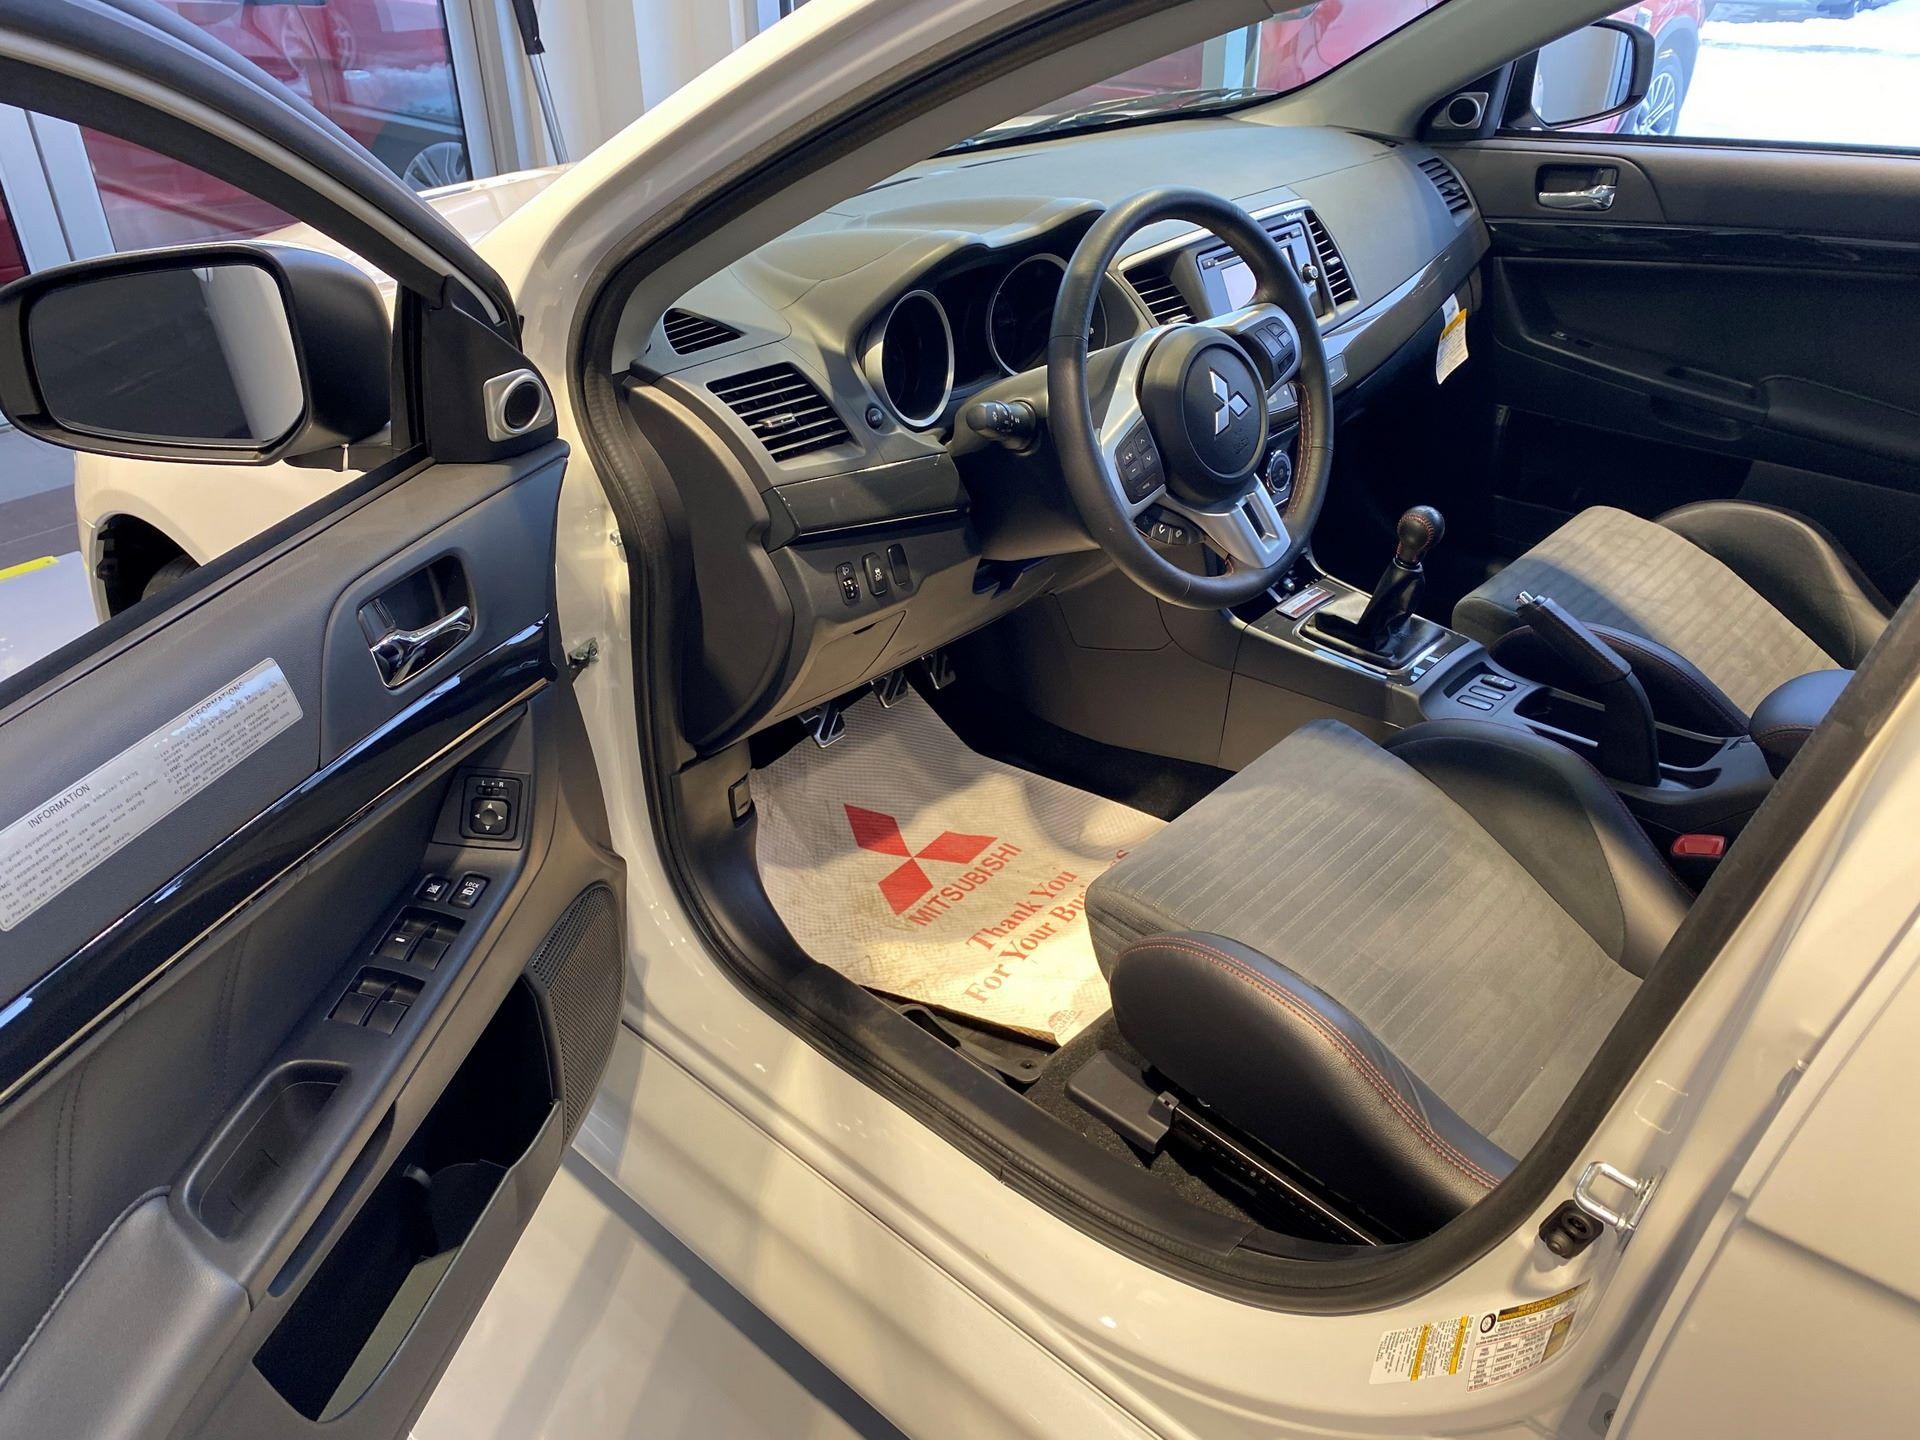 Mitsubishi-Lancer-Evo-Final-Edition-for-sale-13